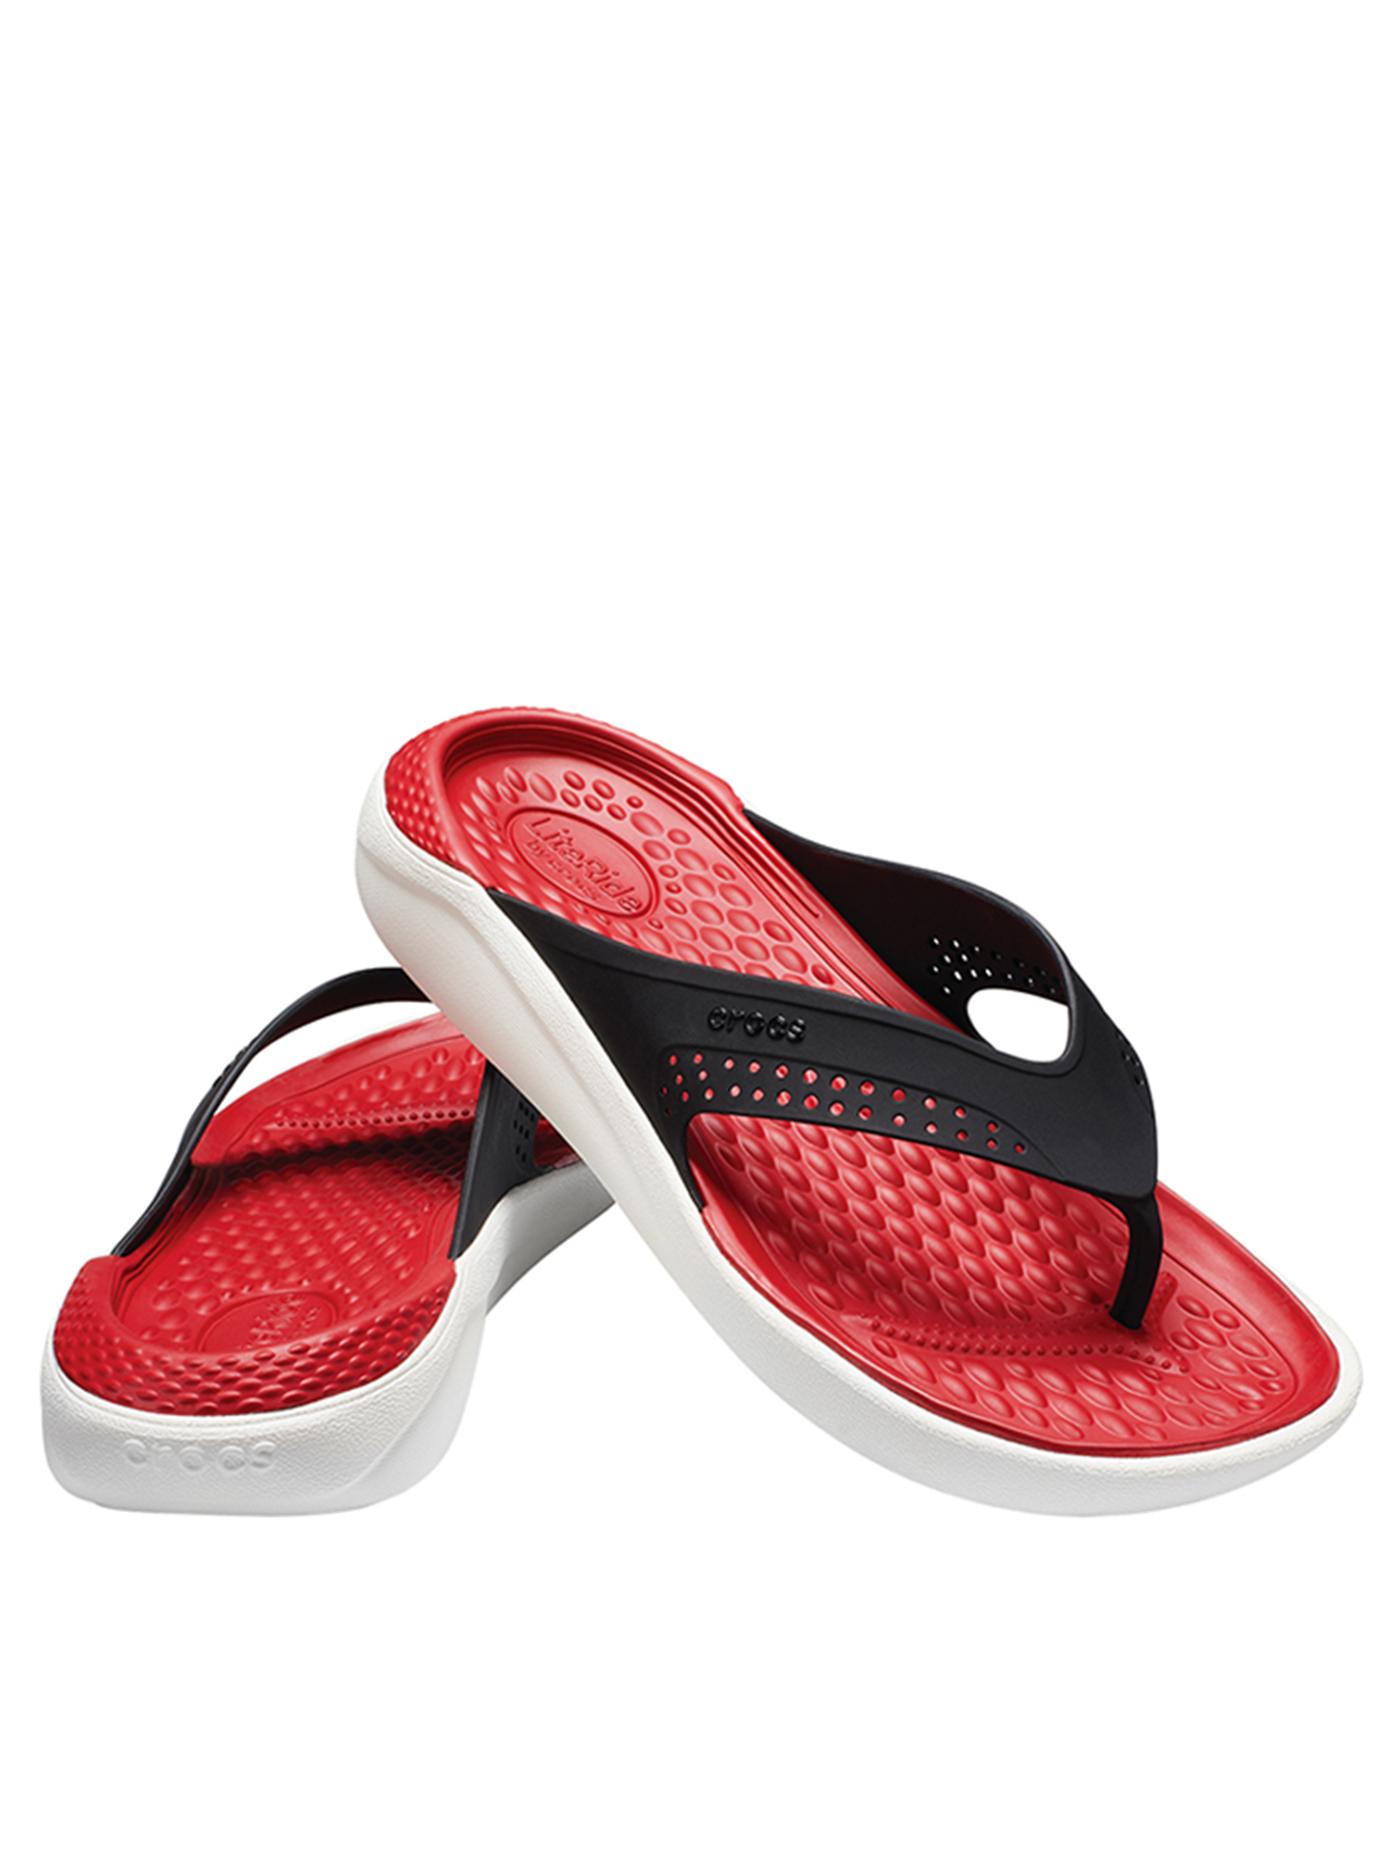 183698e61de918 CROCS Unisex  Sandal Literide Flip Red-White Size M9 W11 Red-White